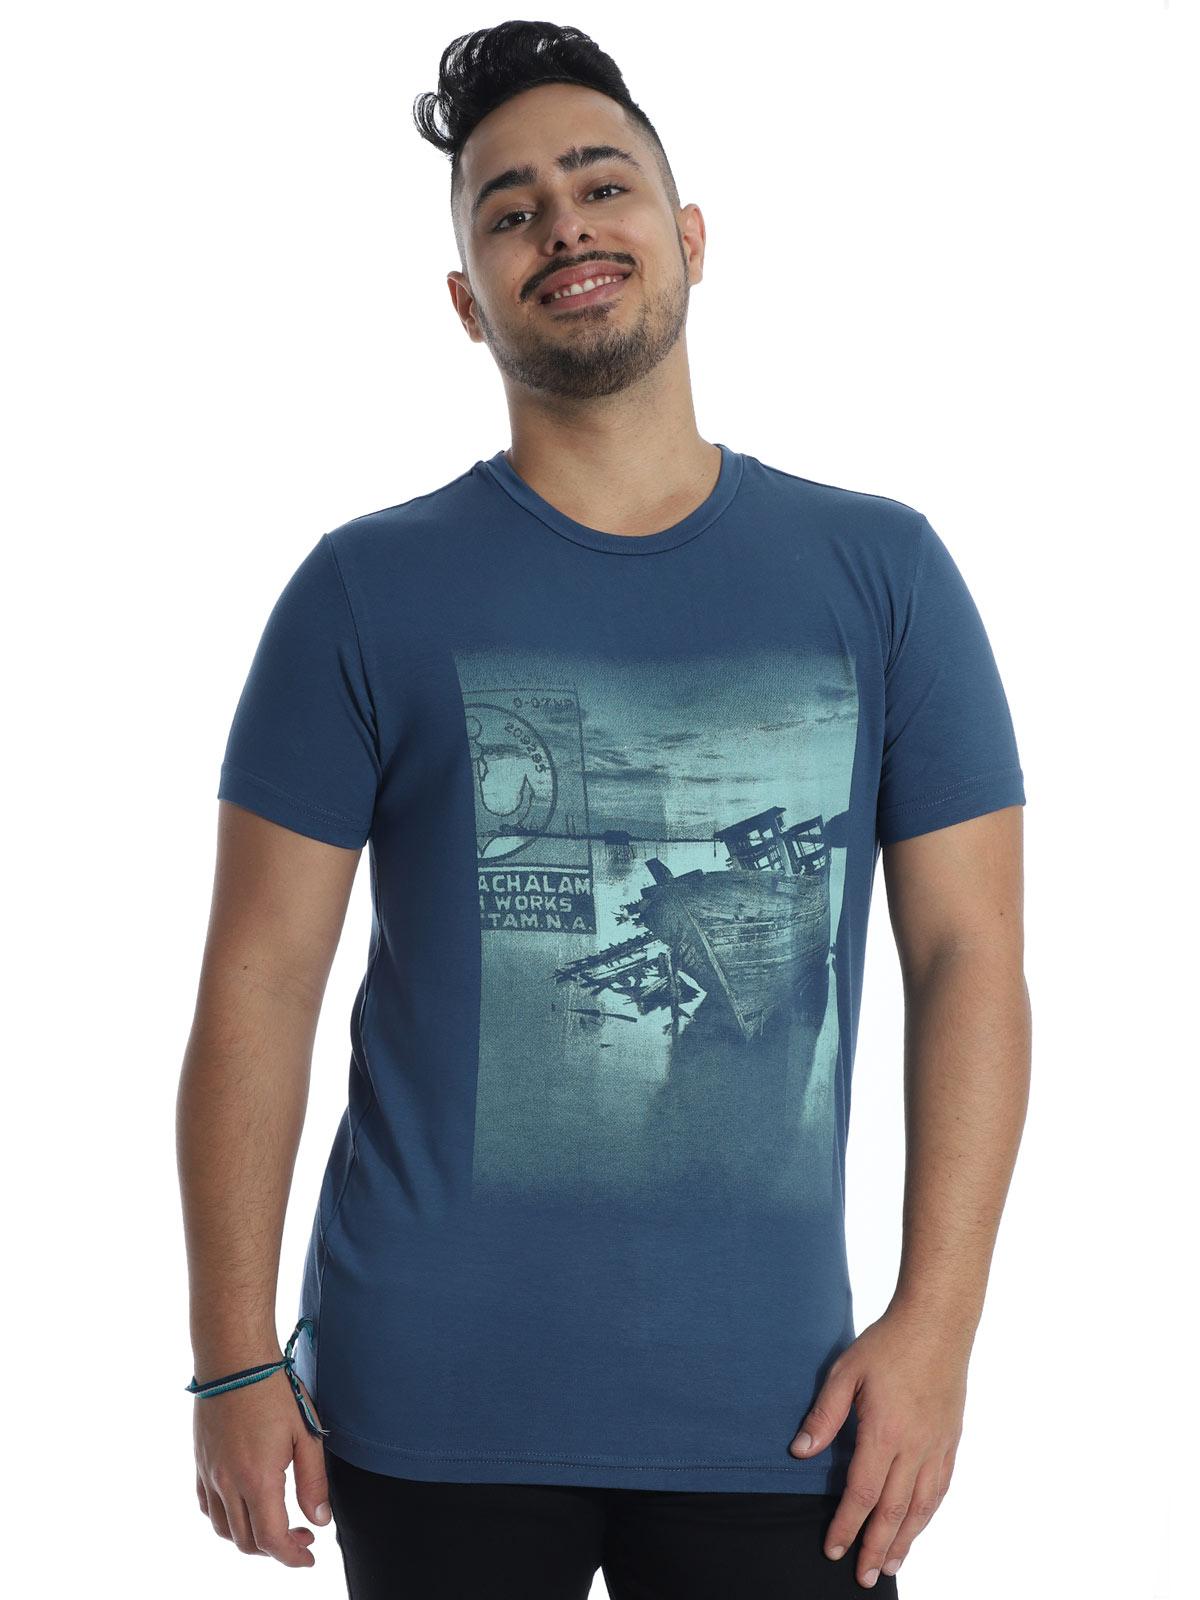 Camiseta Masculina Viscolycra Slim Fit Boat Anistia Azul